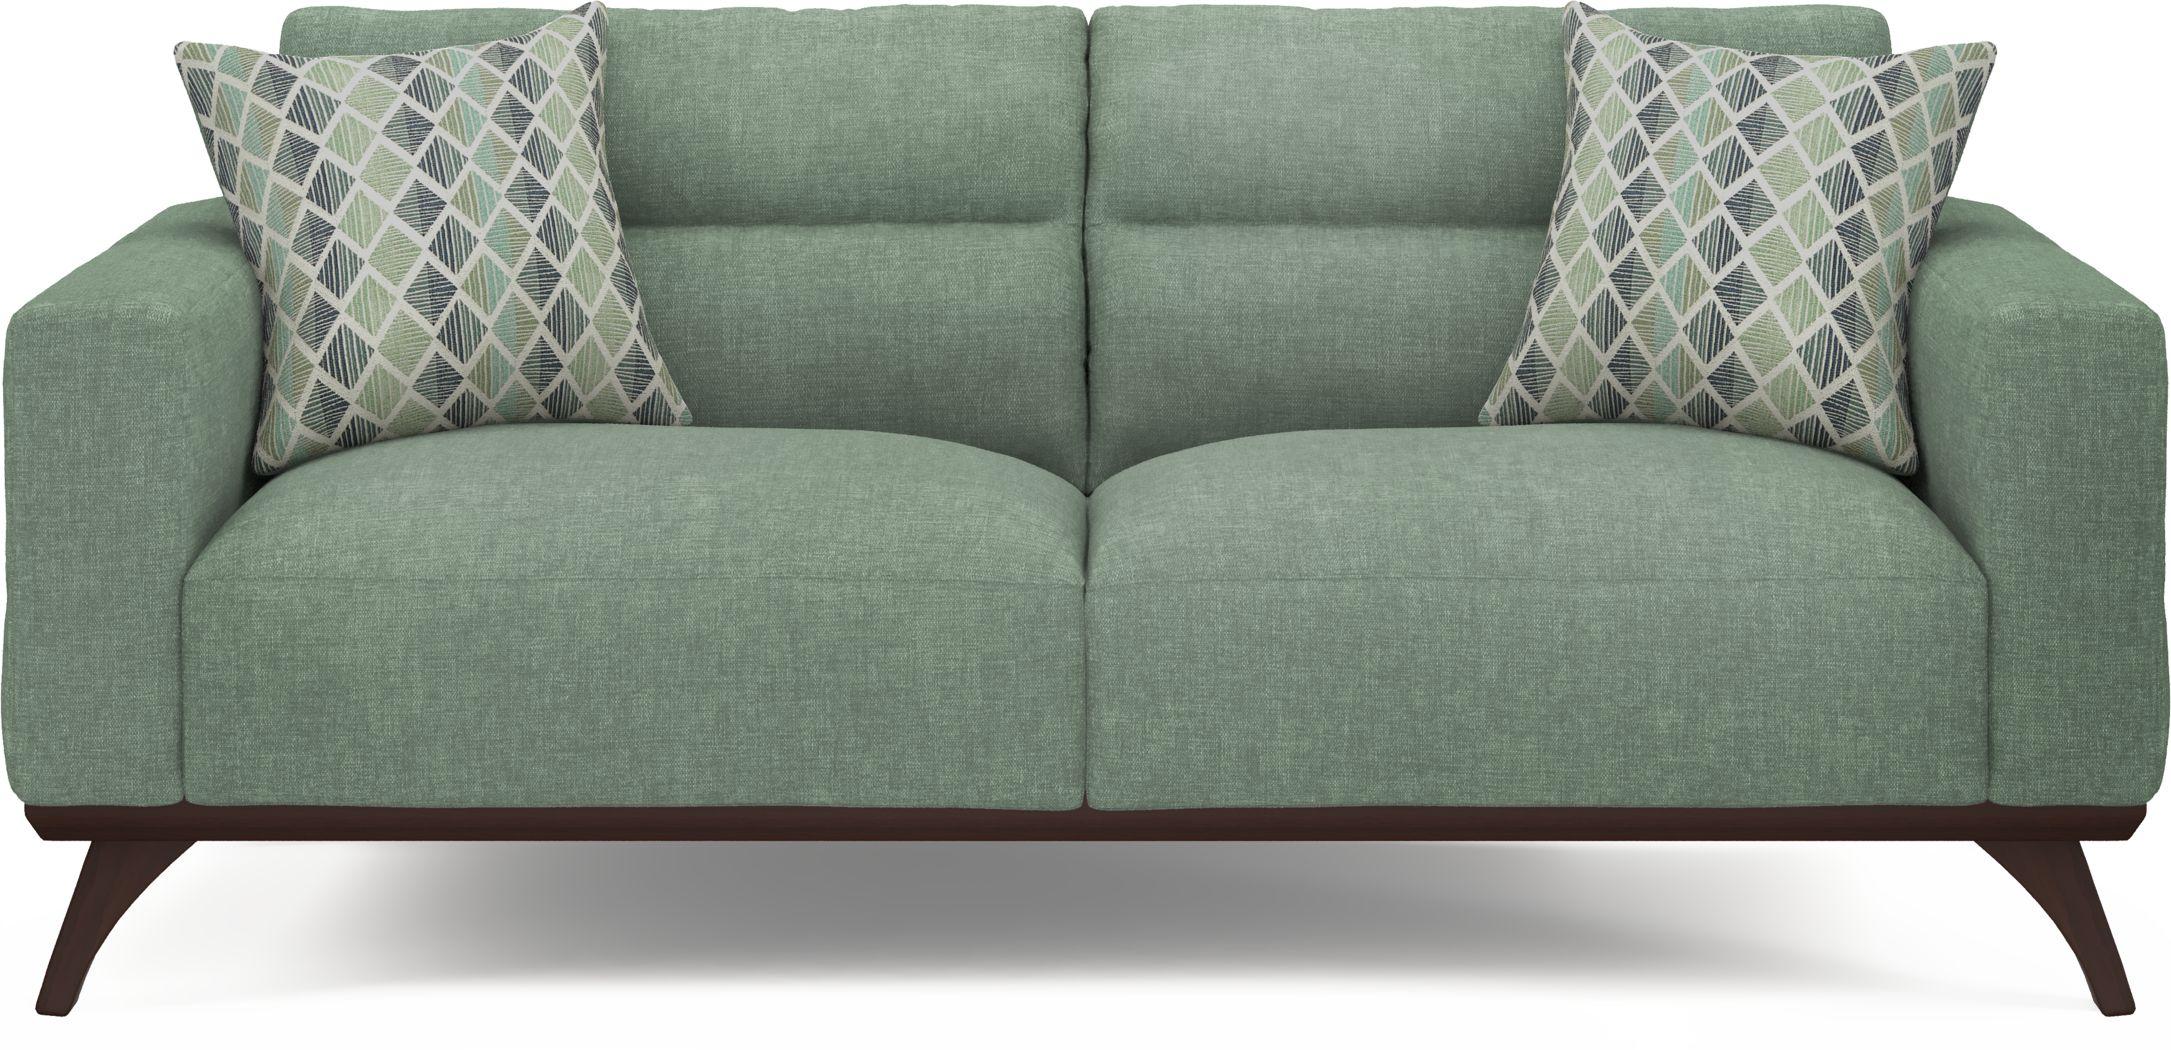 Broadview Park Sage Sofa